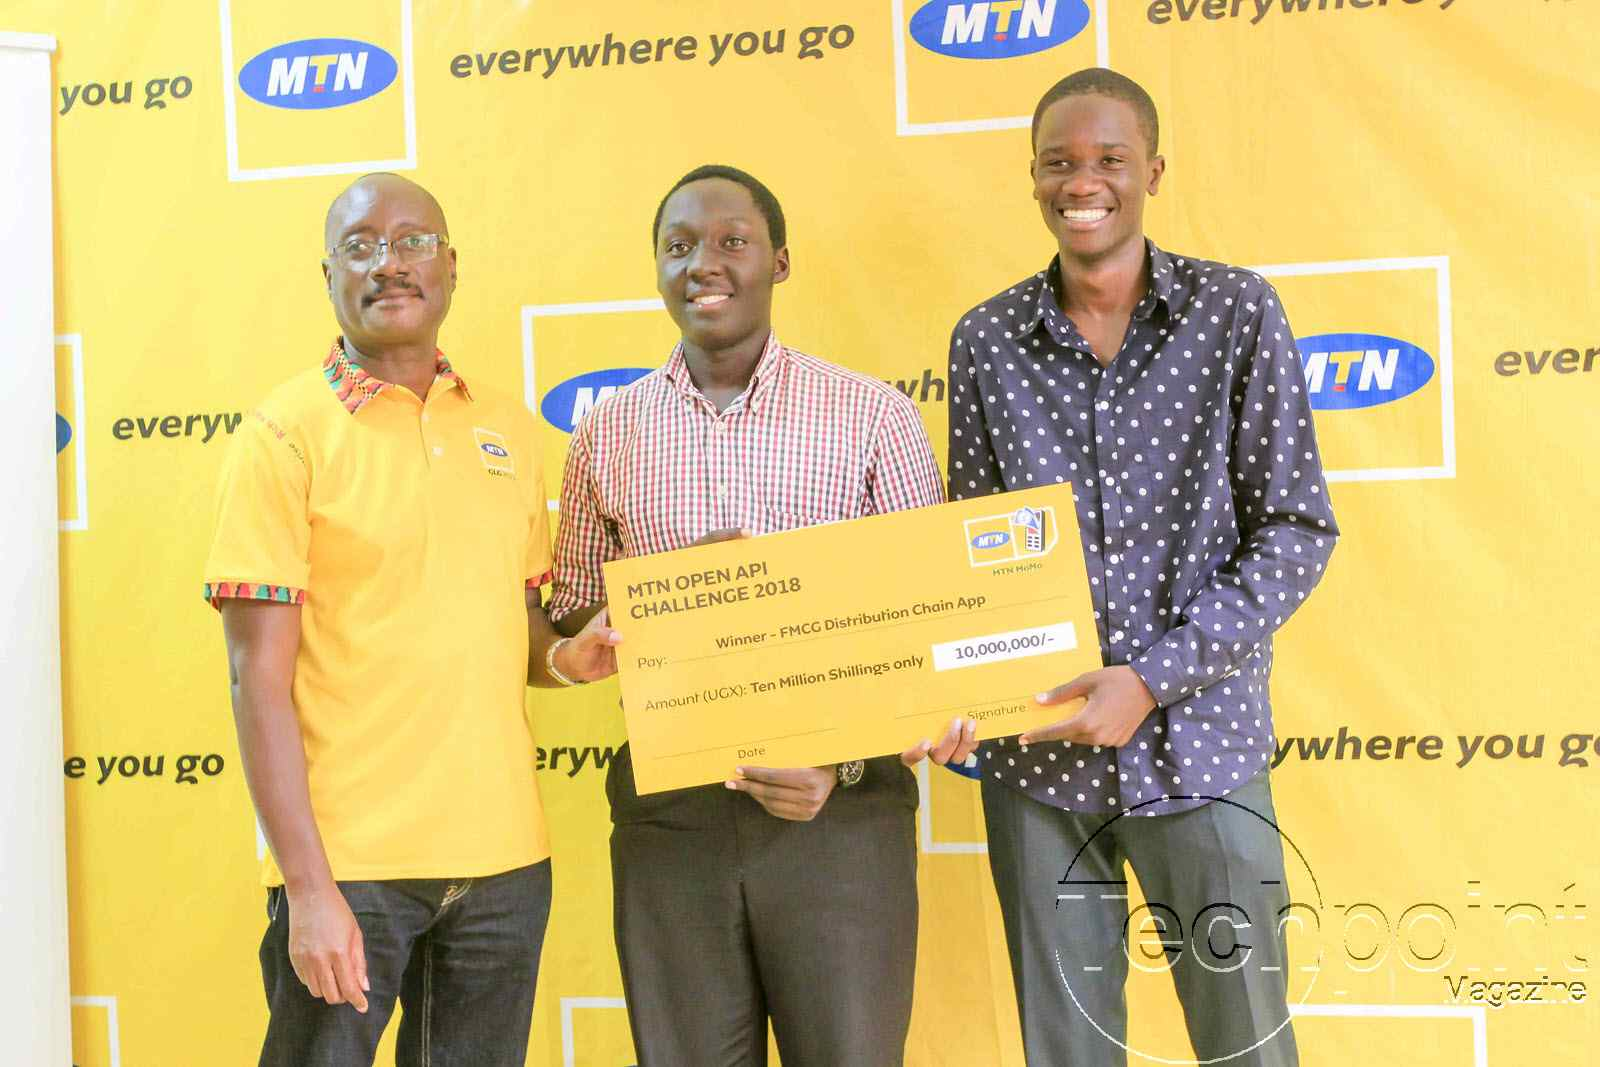 MTN CEO Gordian Kyomukama Handing over the MTN OPEN API Challenge Cheque